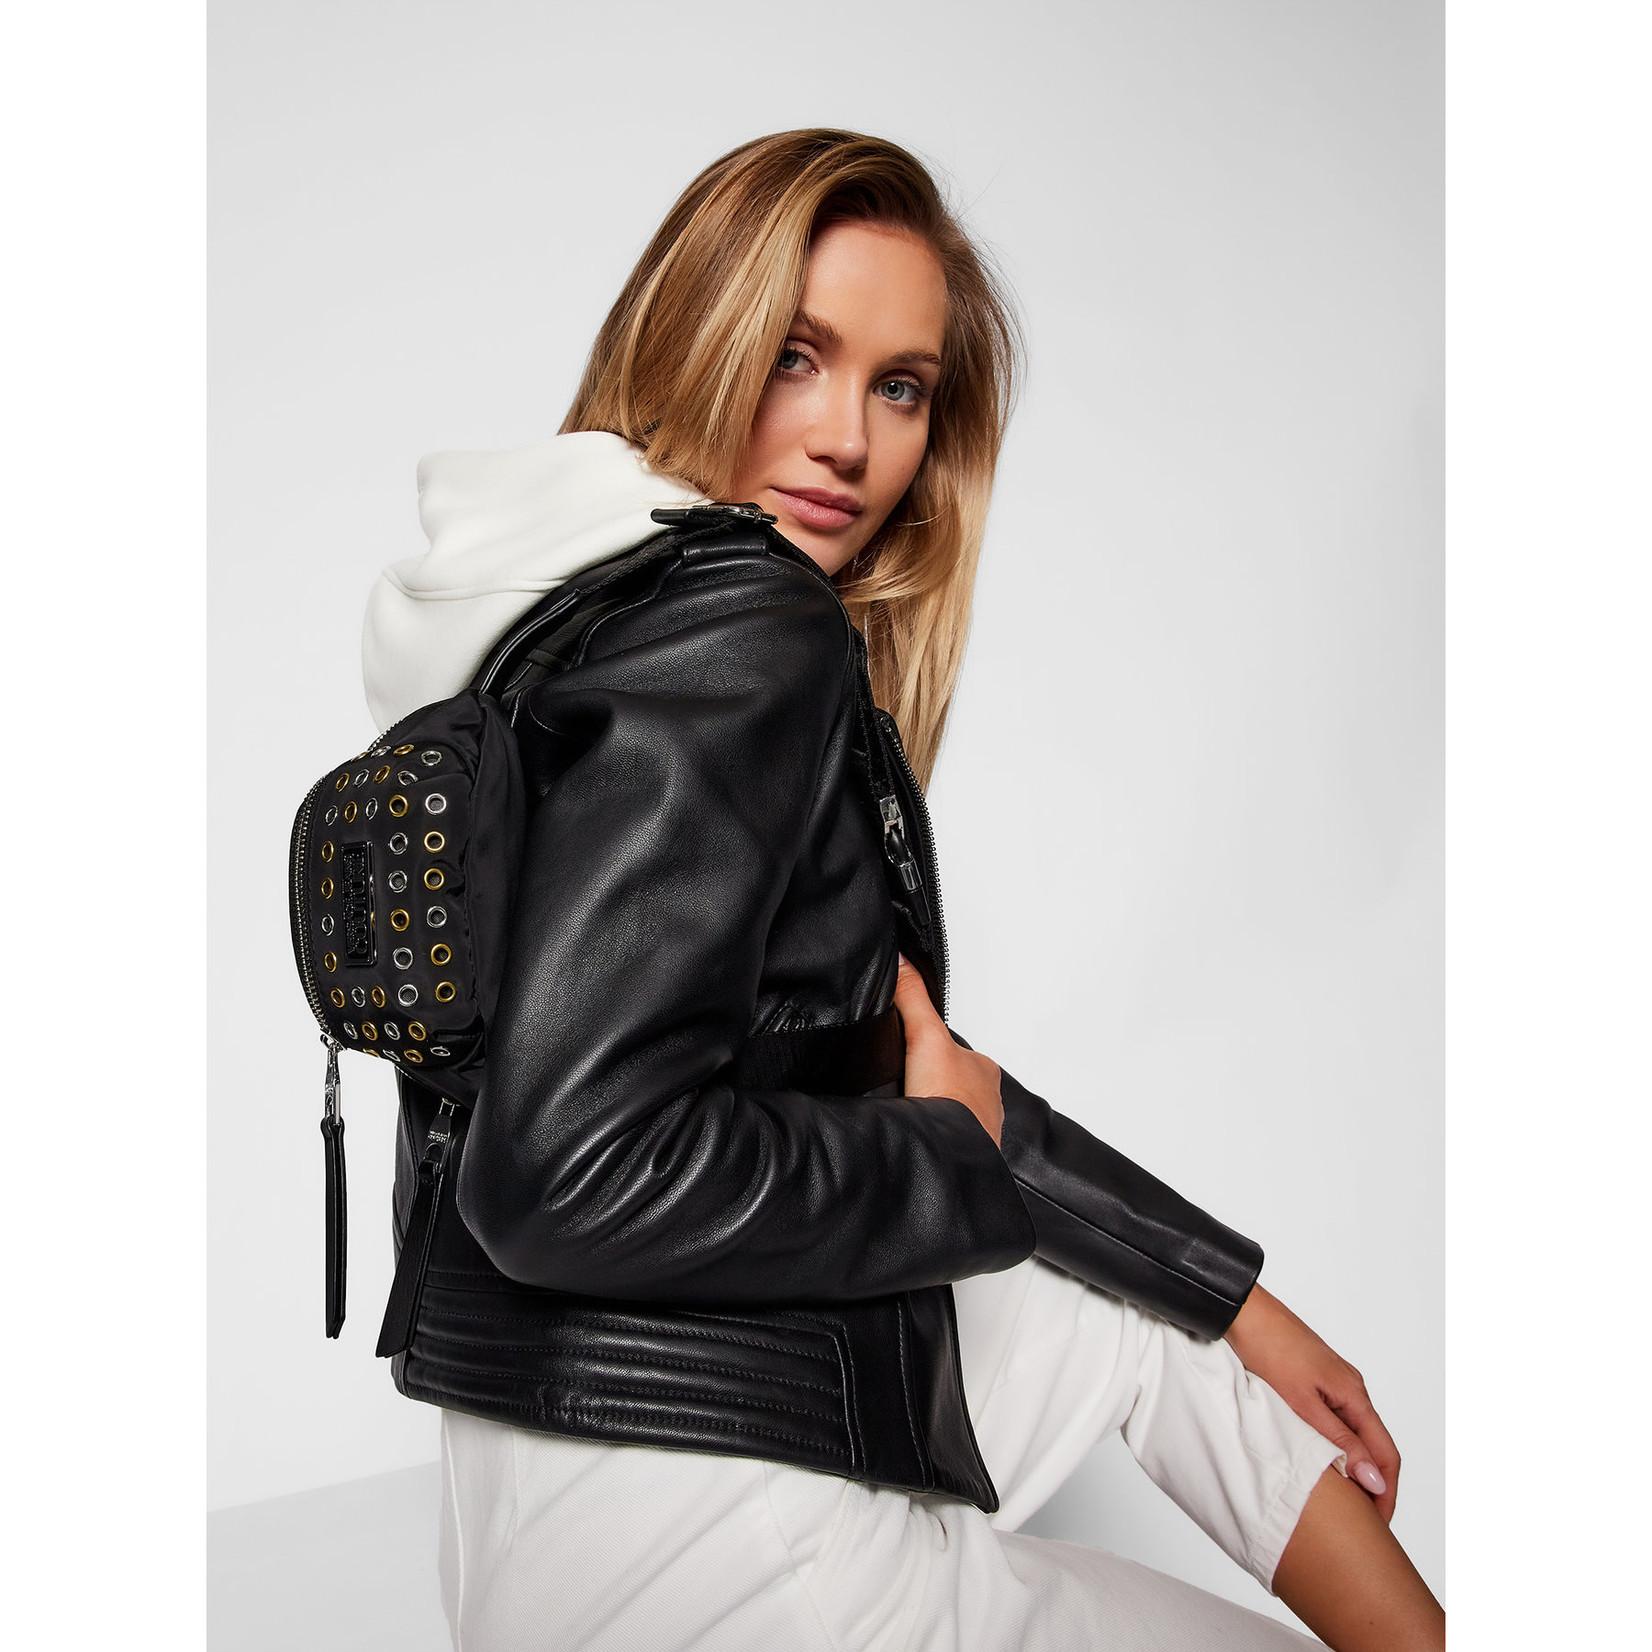 VERSACE JEANS COUTURE VERSACE JEANS COUTURE WOMEN'S BANANA BAG  ALLOVER EYELETS - E1VWABX5 BLACK